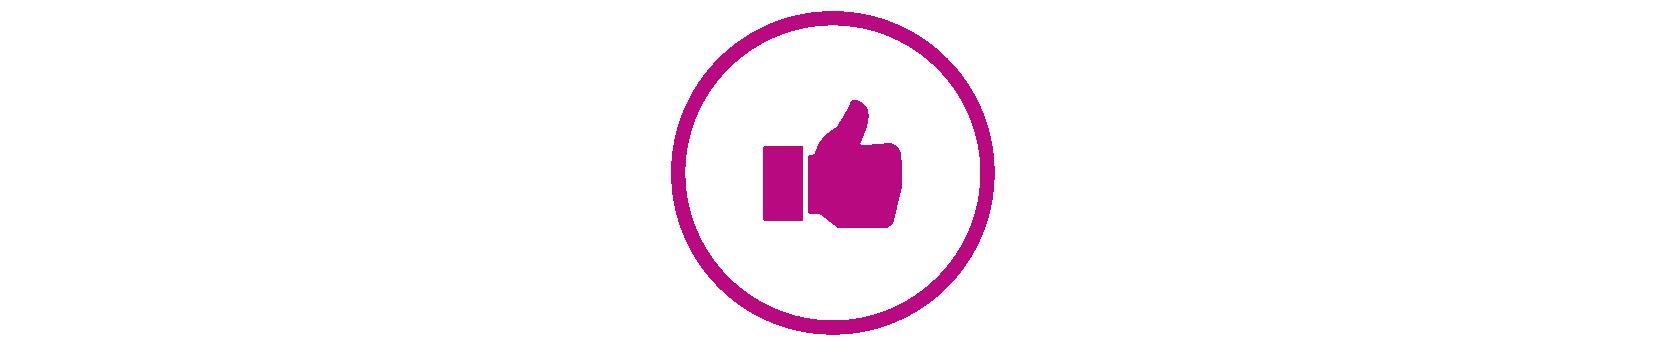 Ikoner_Efftre_Improvement_b80980_Feedback_Rityta 1.png